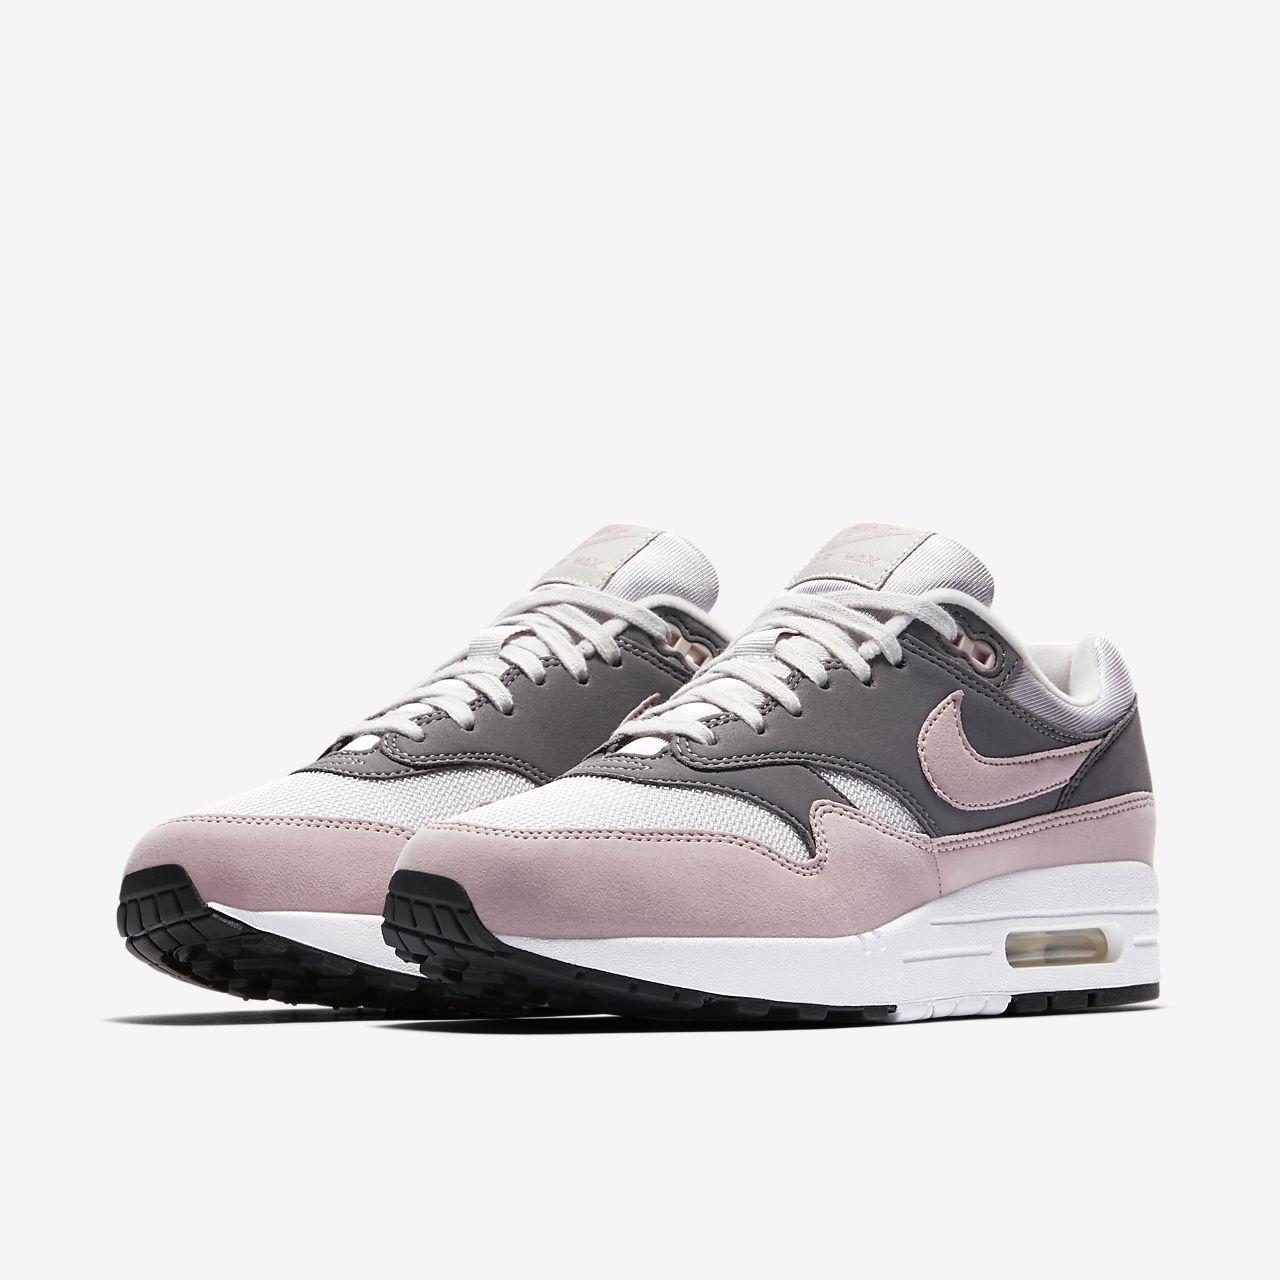 Nike Nike Nike Air Max 1 Damenschuh    | Viele Stile  69b2c5